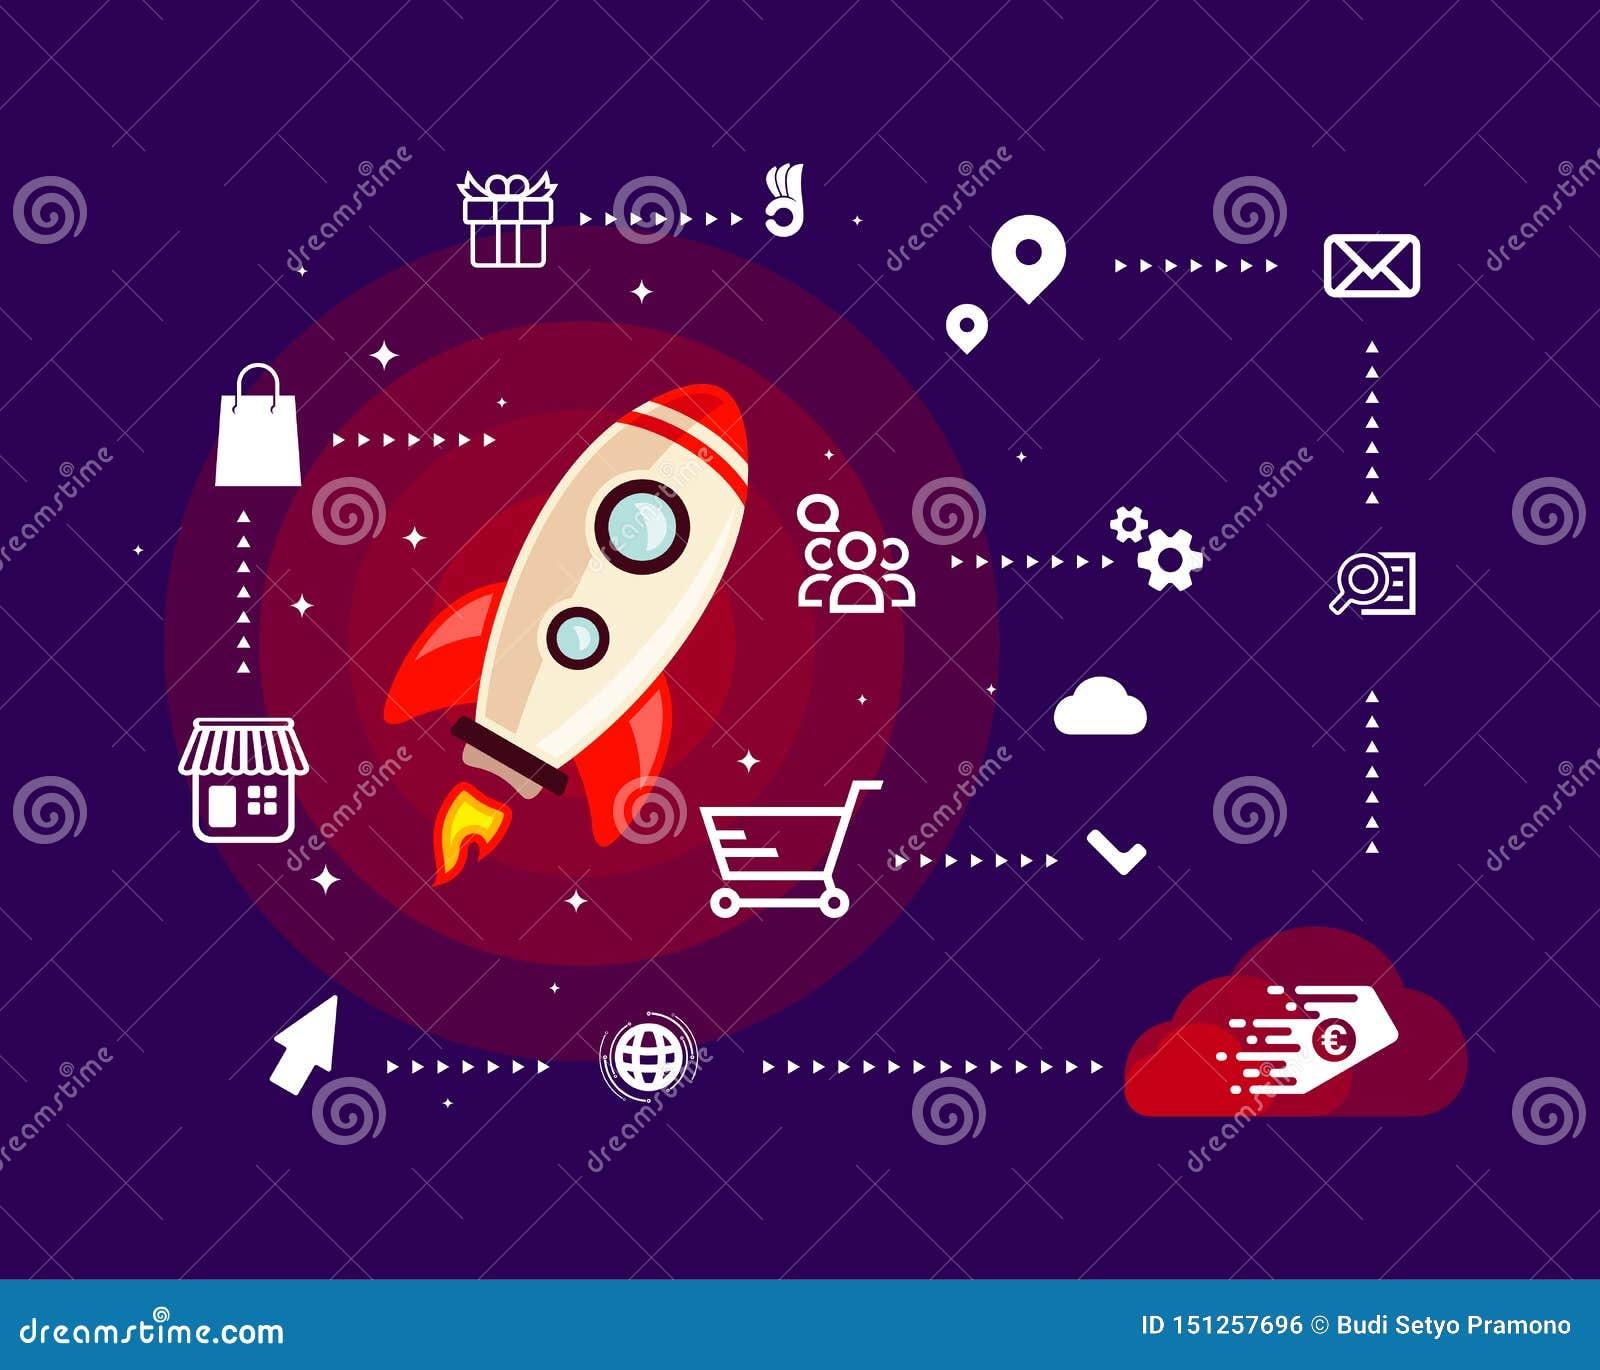 Responsive Design Website Template Modern Flat Vector: Startup Simple Rocket Web Design, Responsive Web Design